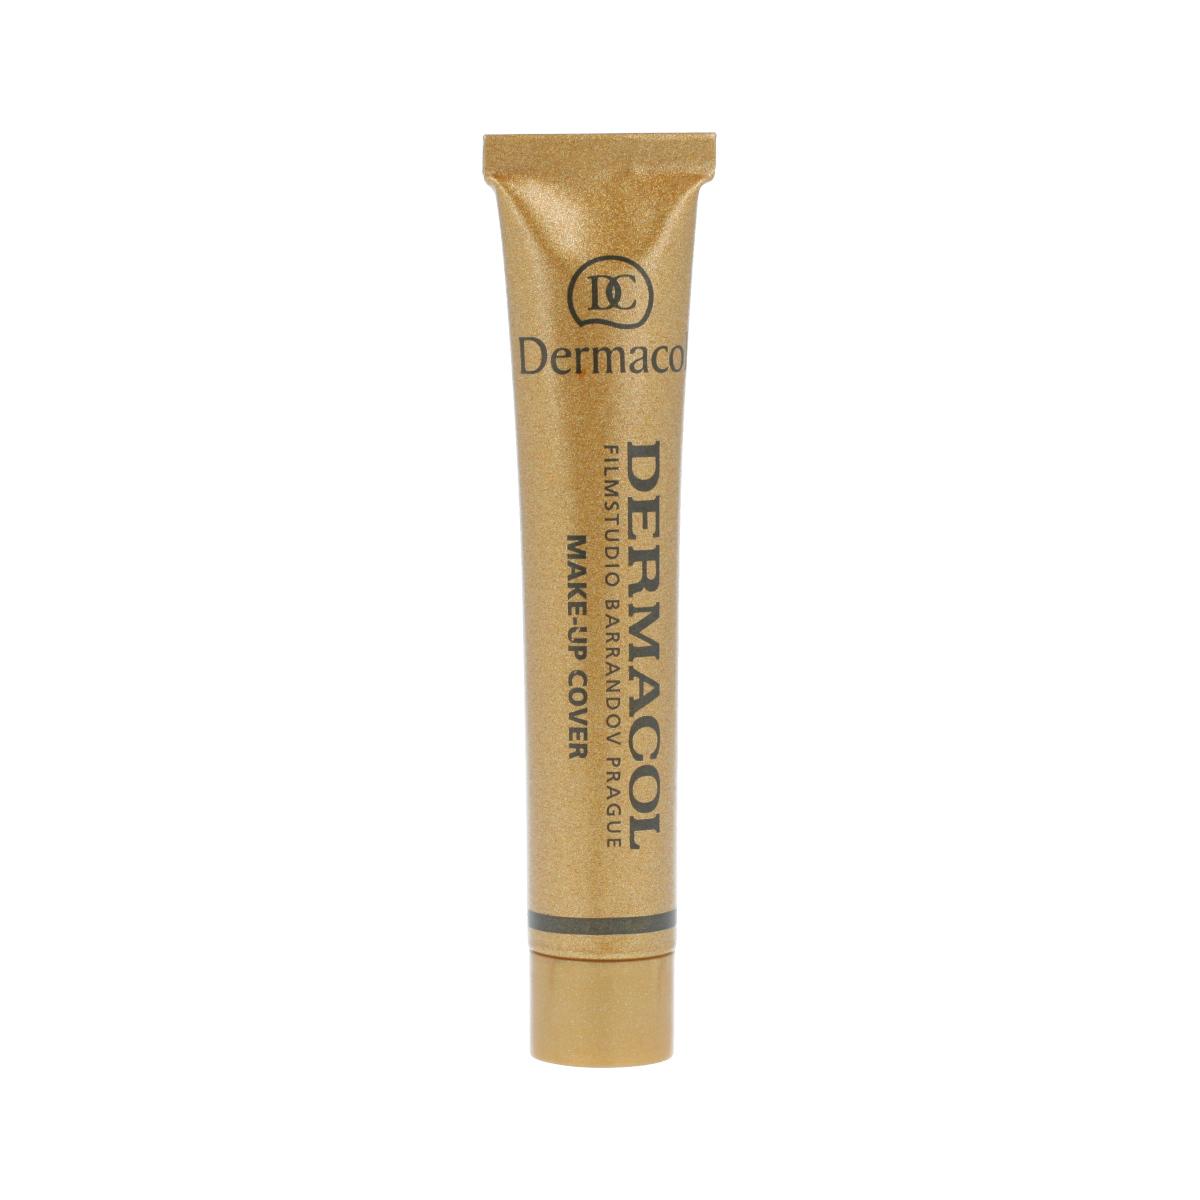 Dermacol Make-Up SPF 30 (208) 30 g 91039